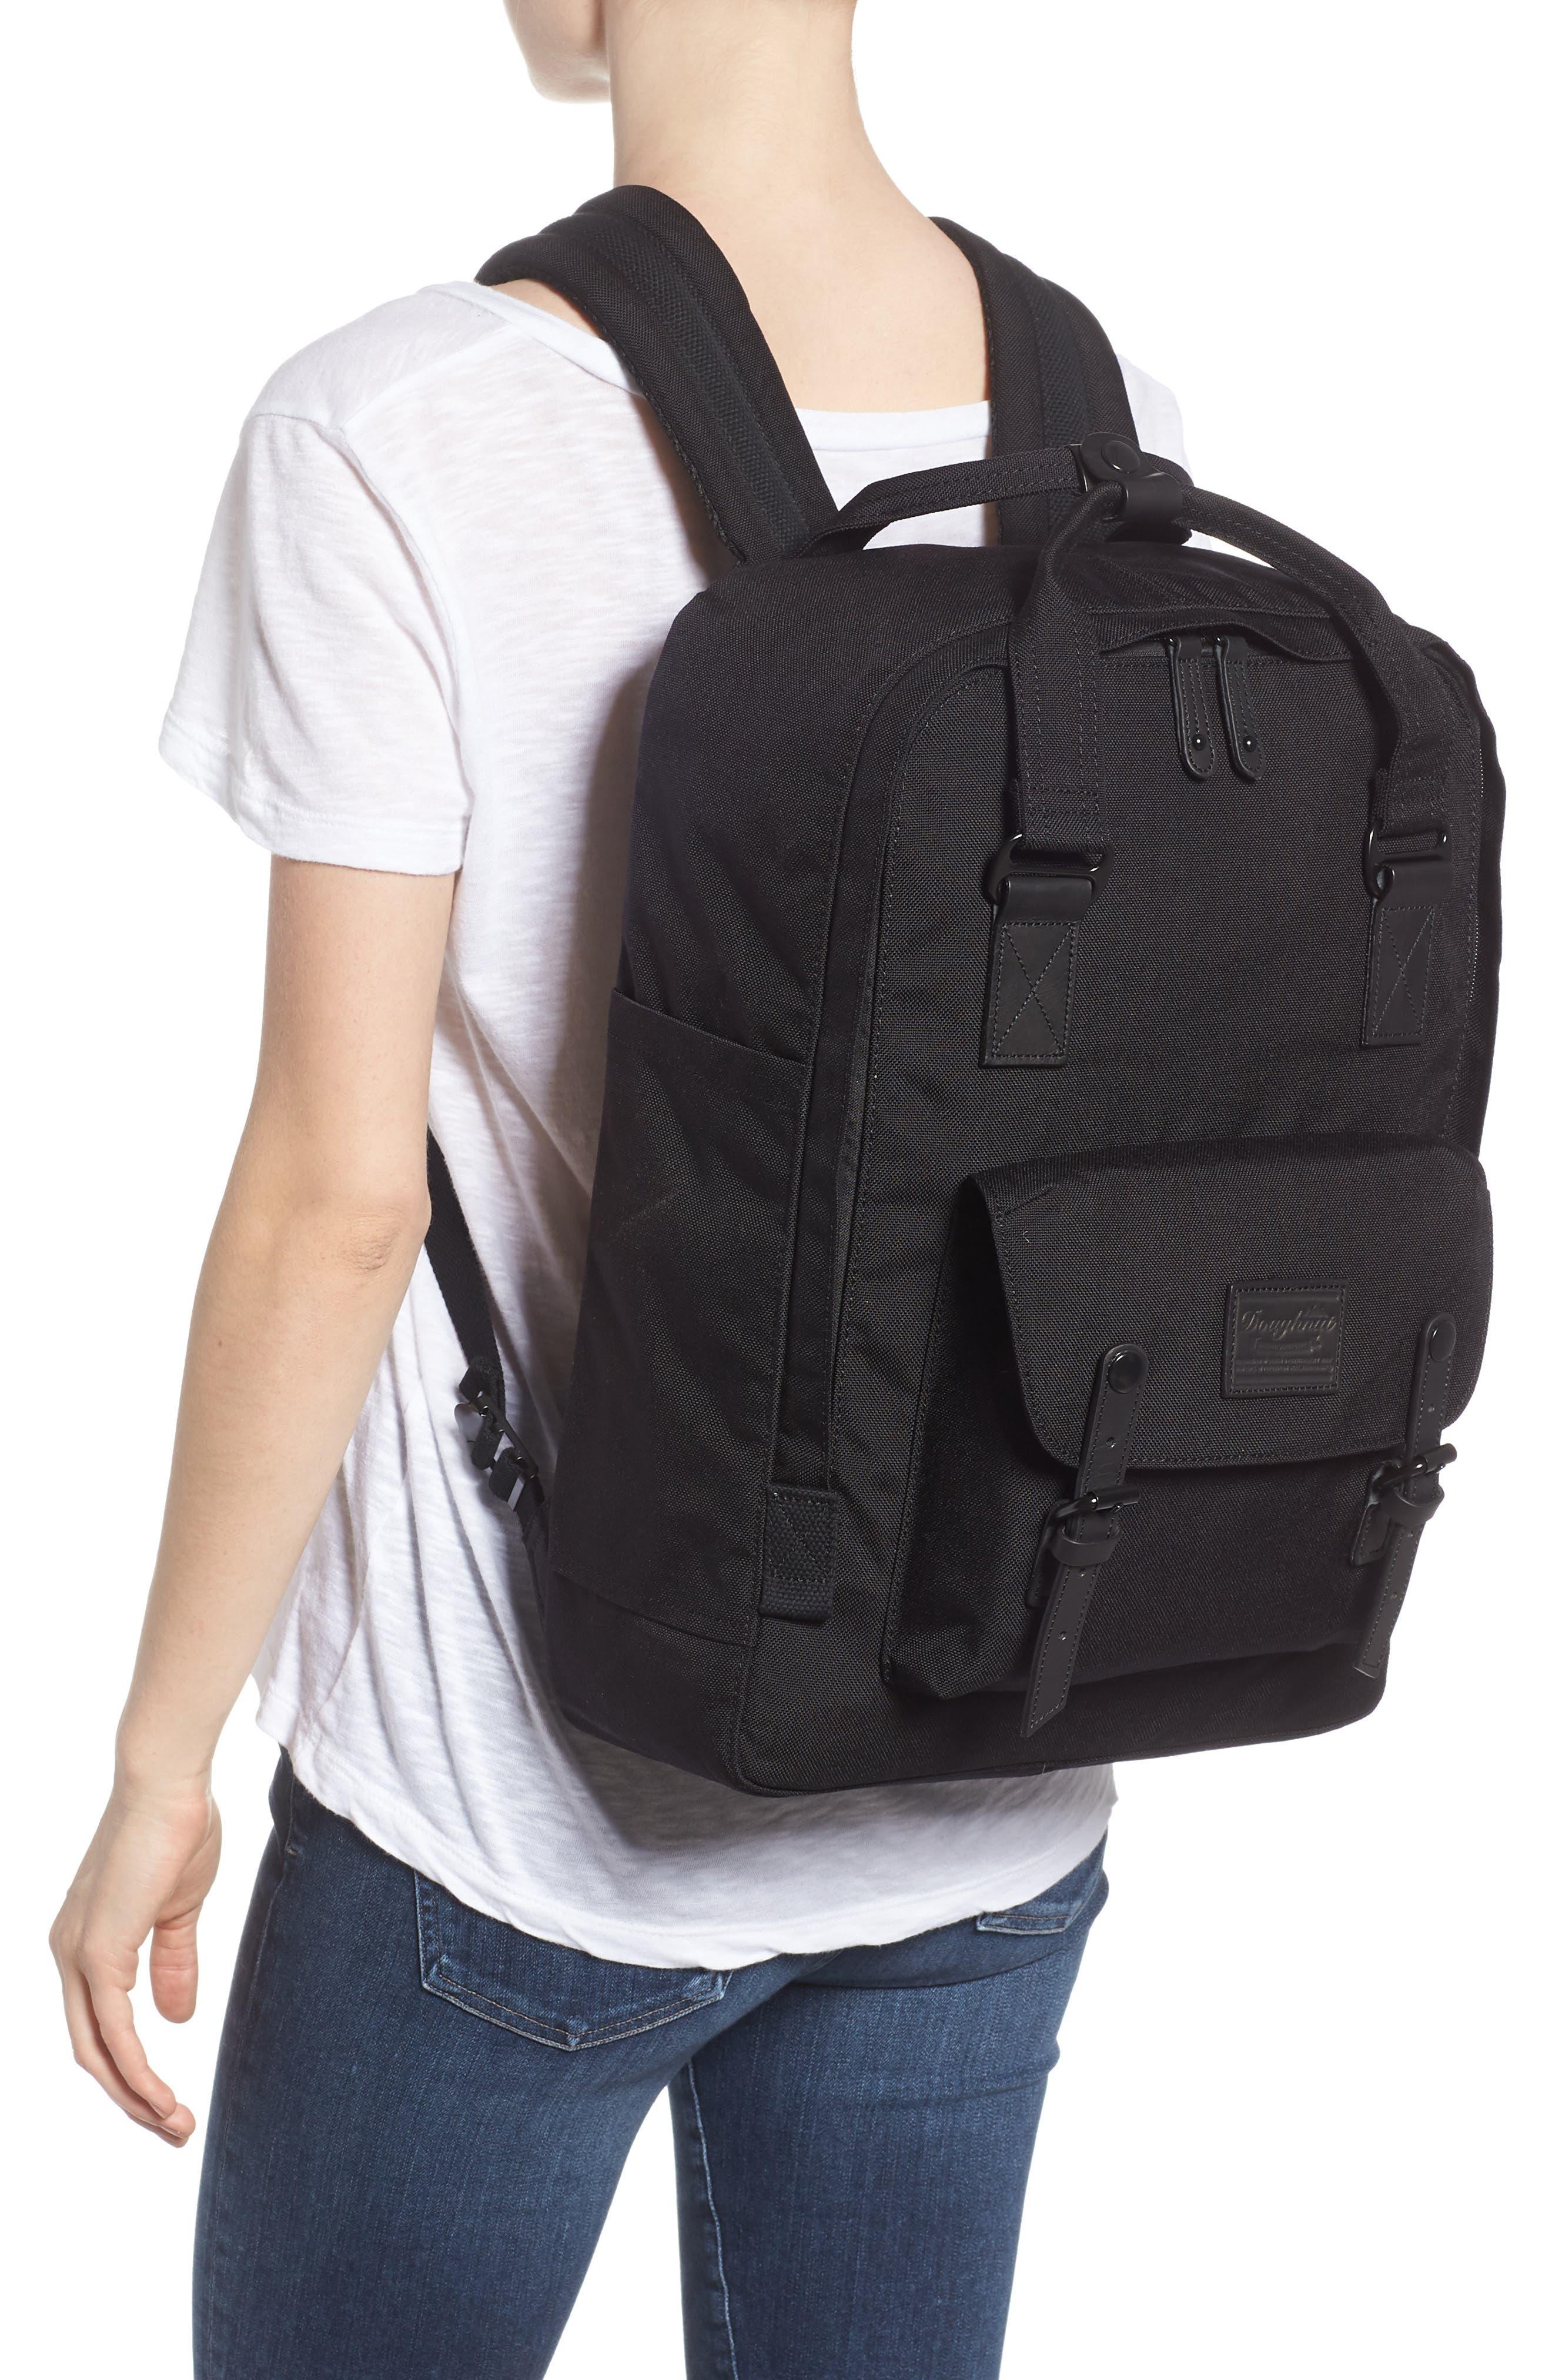 Macaroon Large Cordura<sup>®</sup> Black Series Water Repellent Backpack,                             Alternate thumbnail 2, color,                             Black